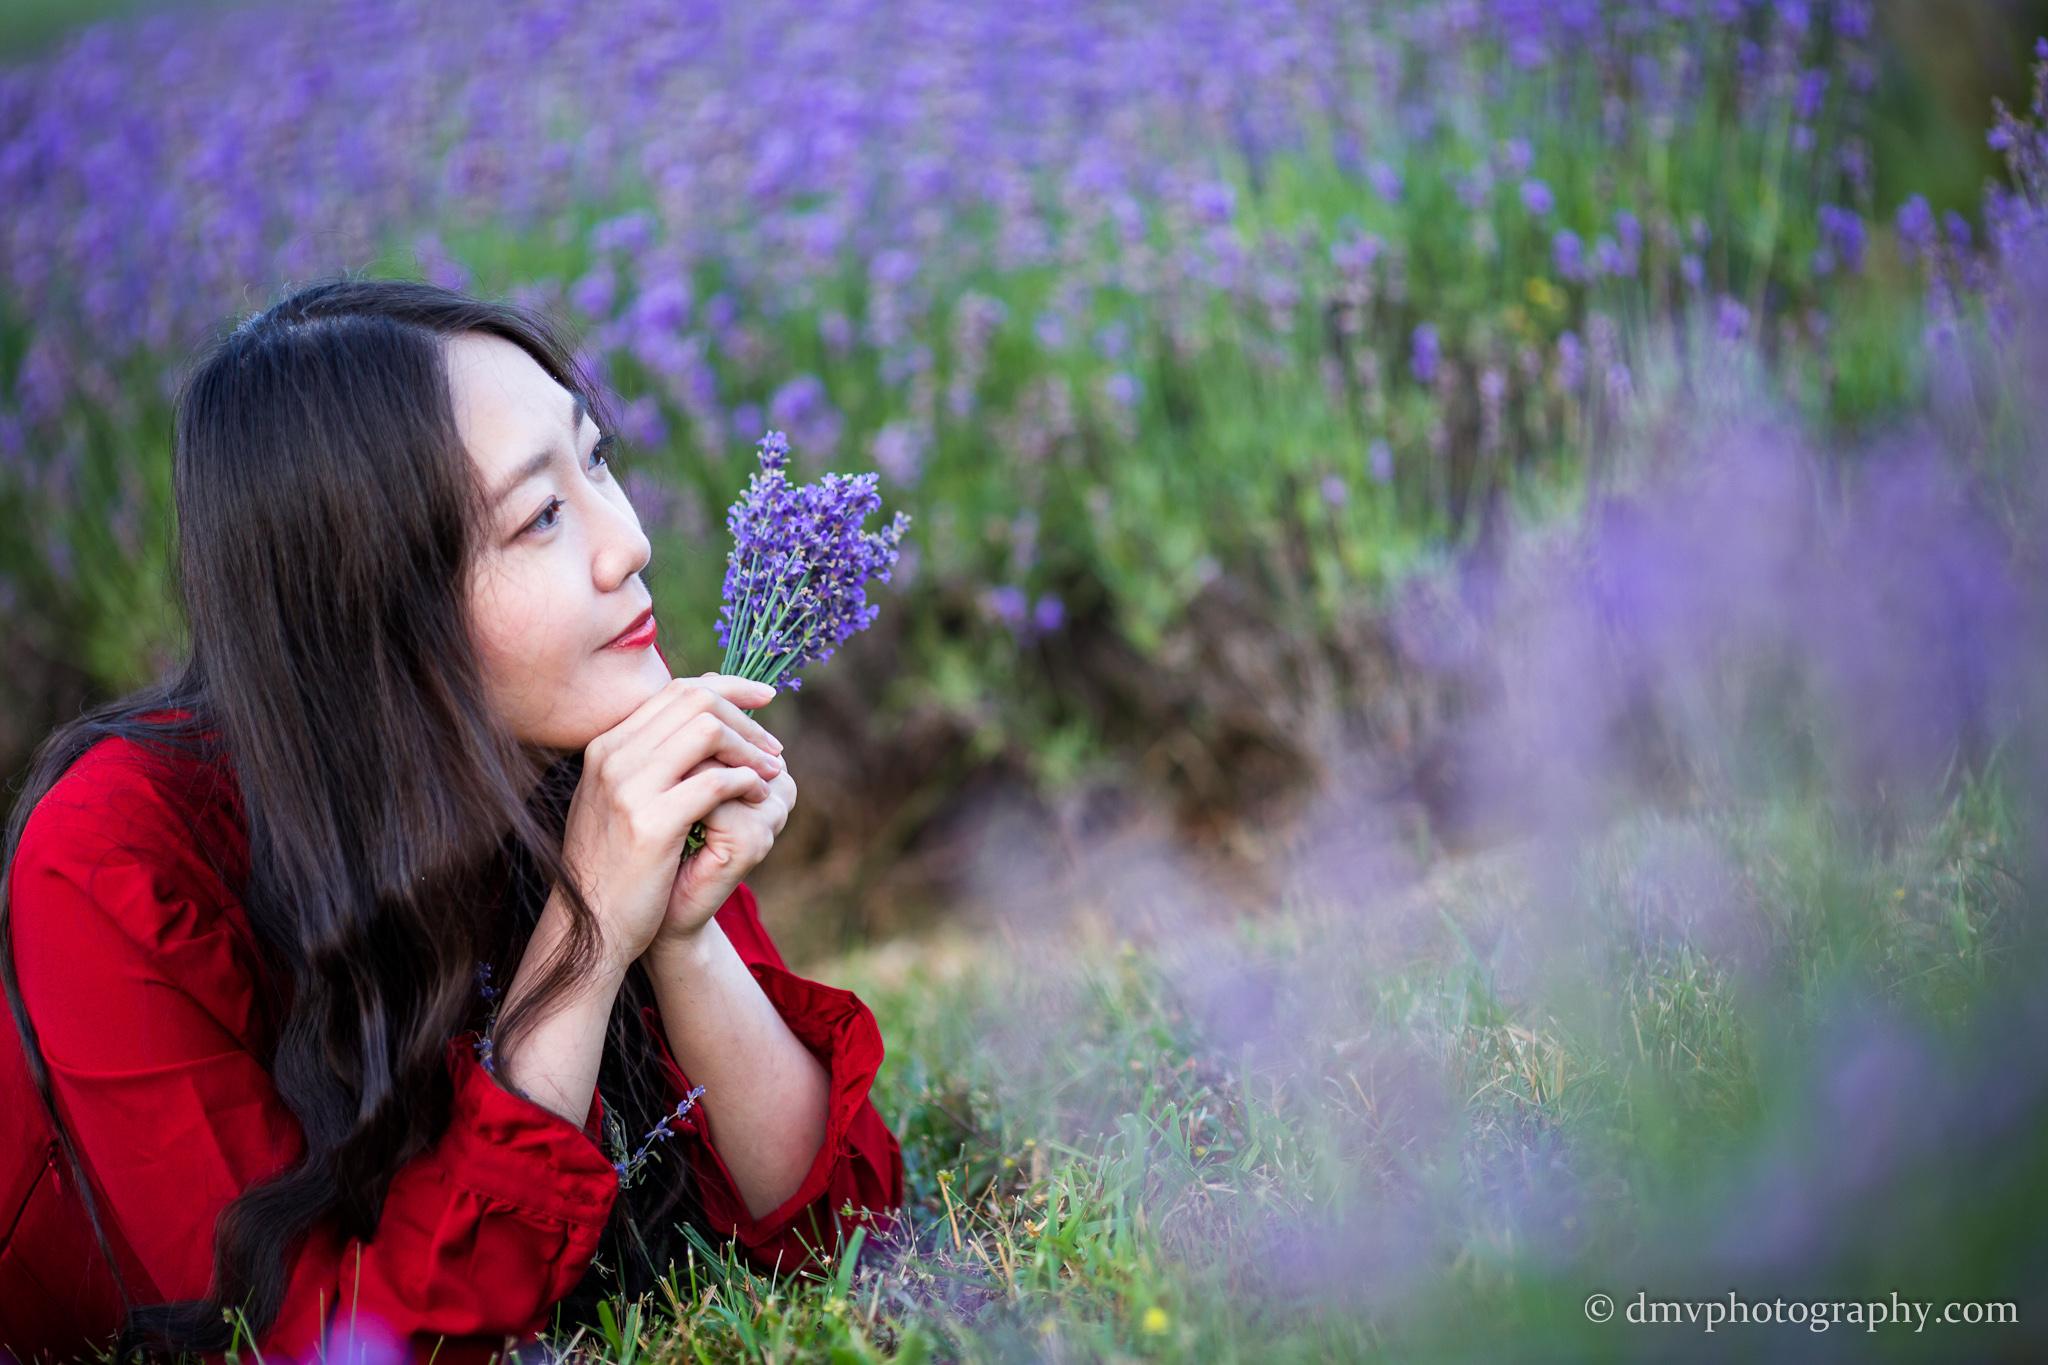 2016-06-24 - Zhu Xing - Lavender Field - 00057